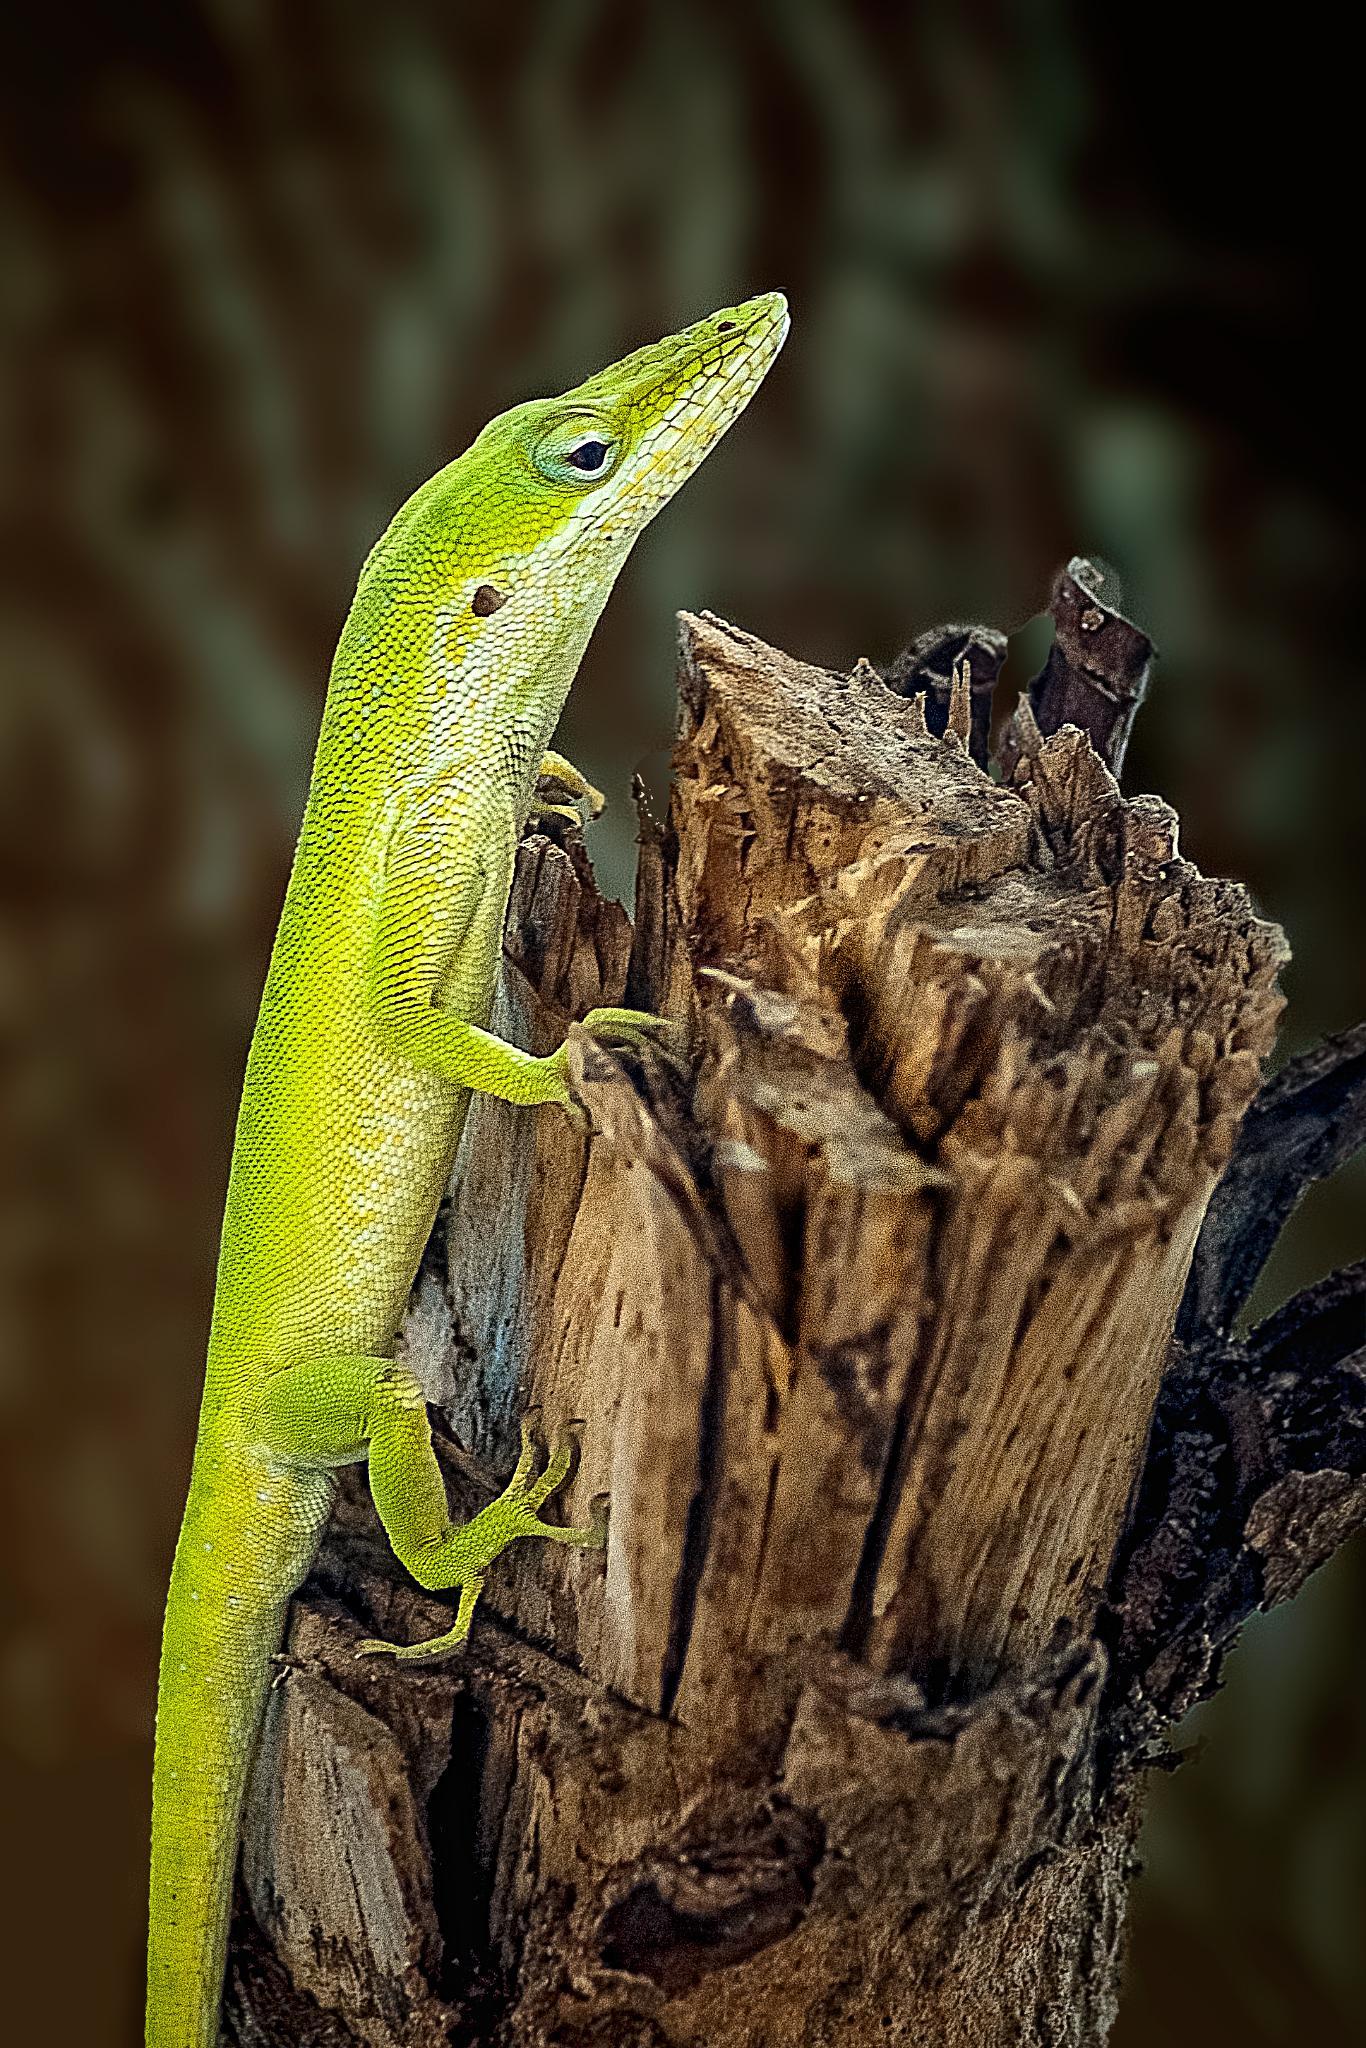 Green lizard - Anolis carolinensis by Tony Guzman